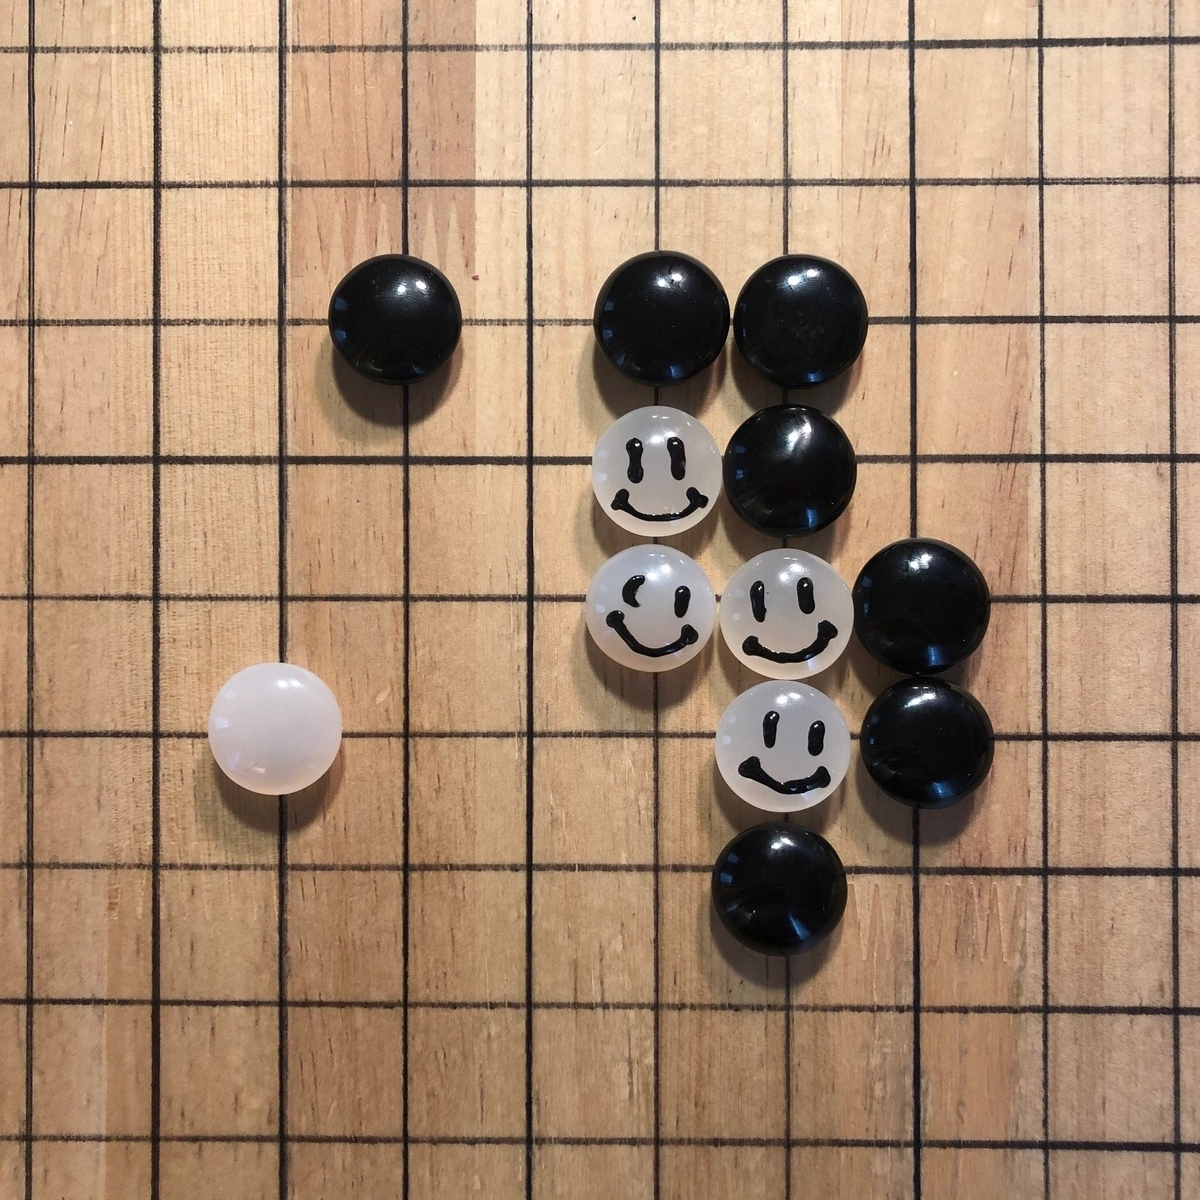 f:id:ryu-igo:20200330143020j:plain